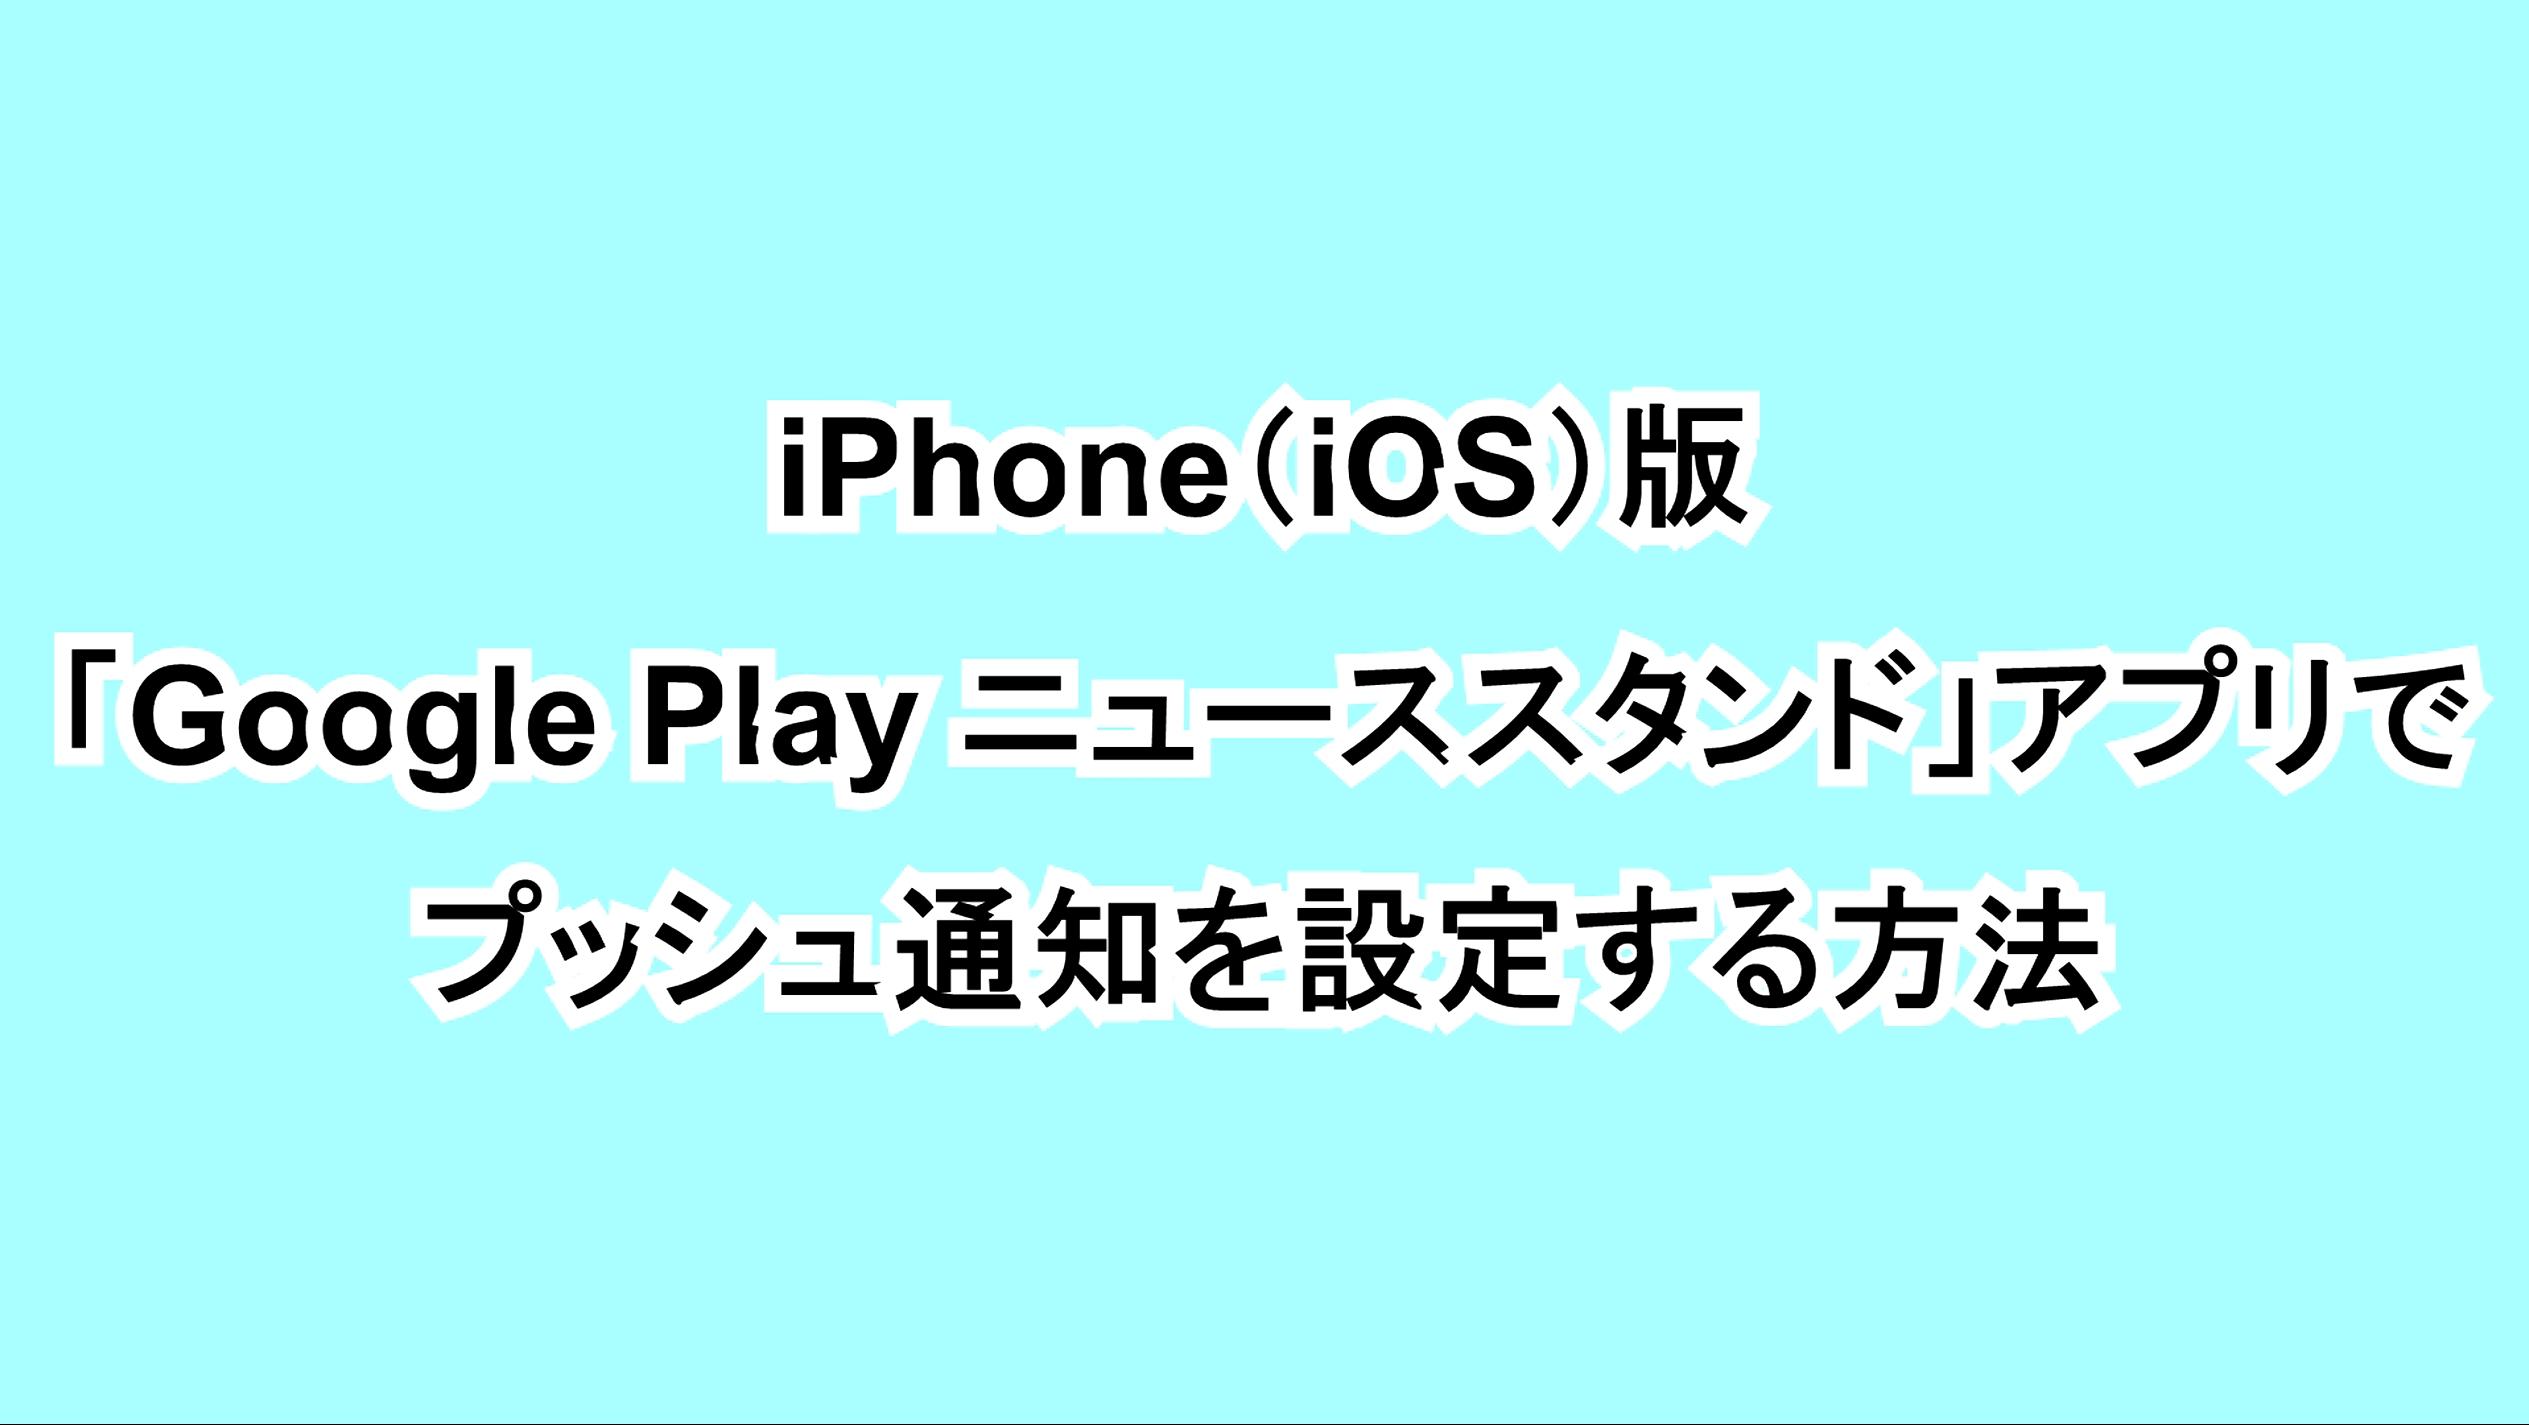 iPhone(iOS)版「Google Play ニューススタンド」アプリでプッシュ通知を設定する方法